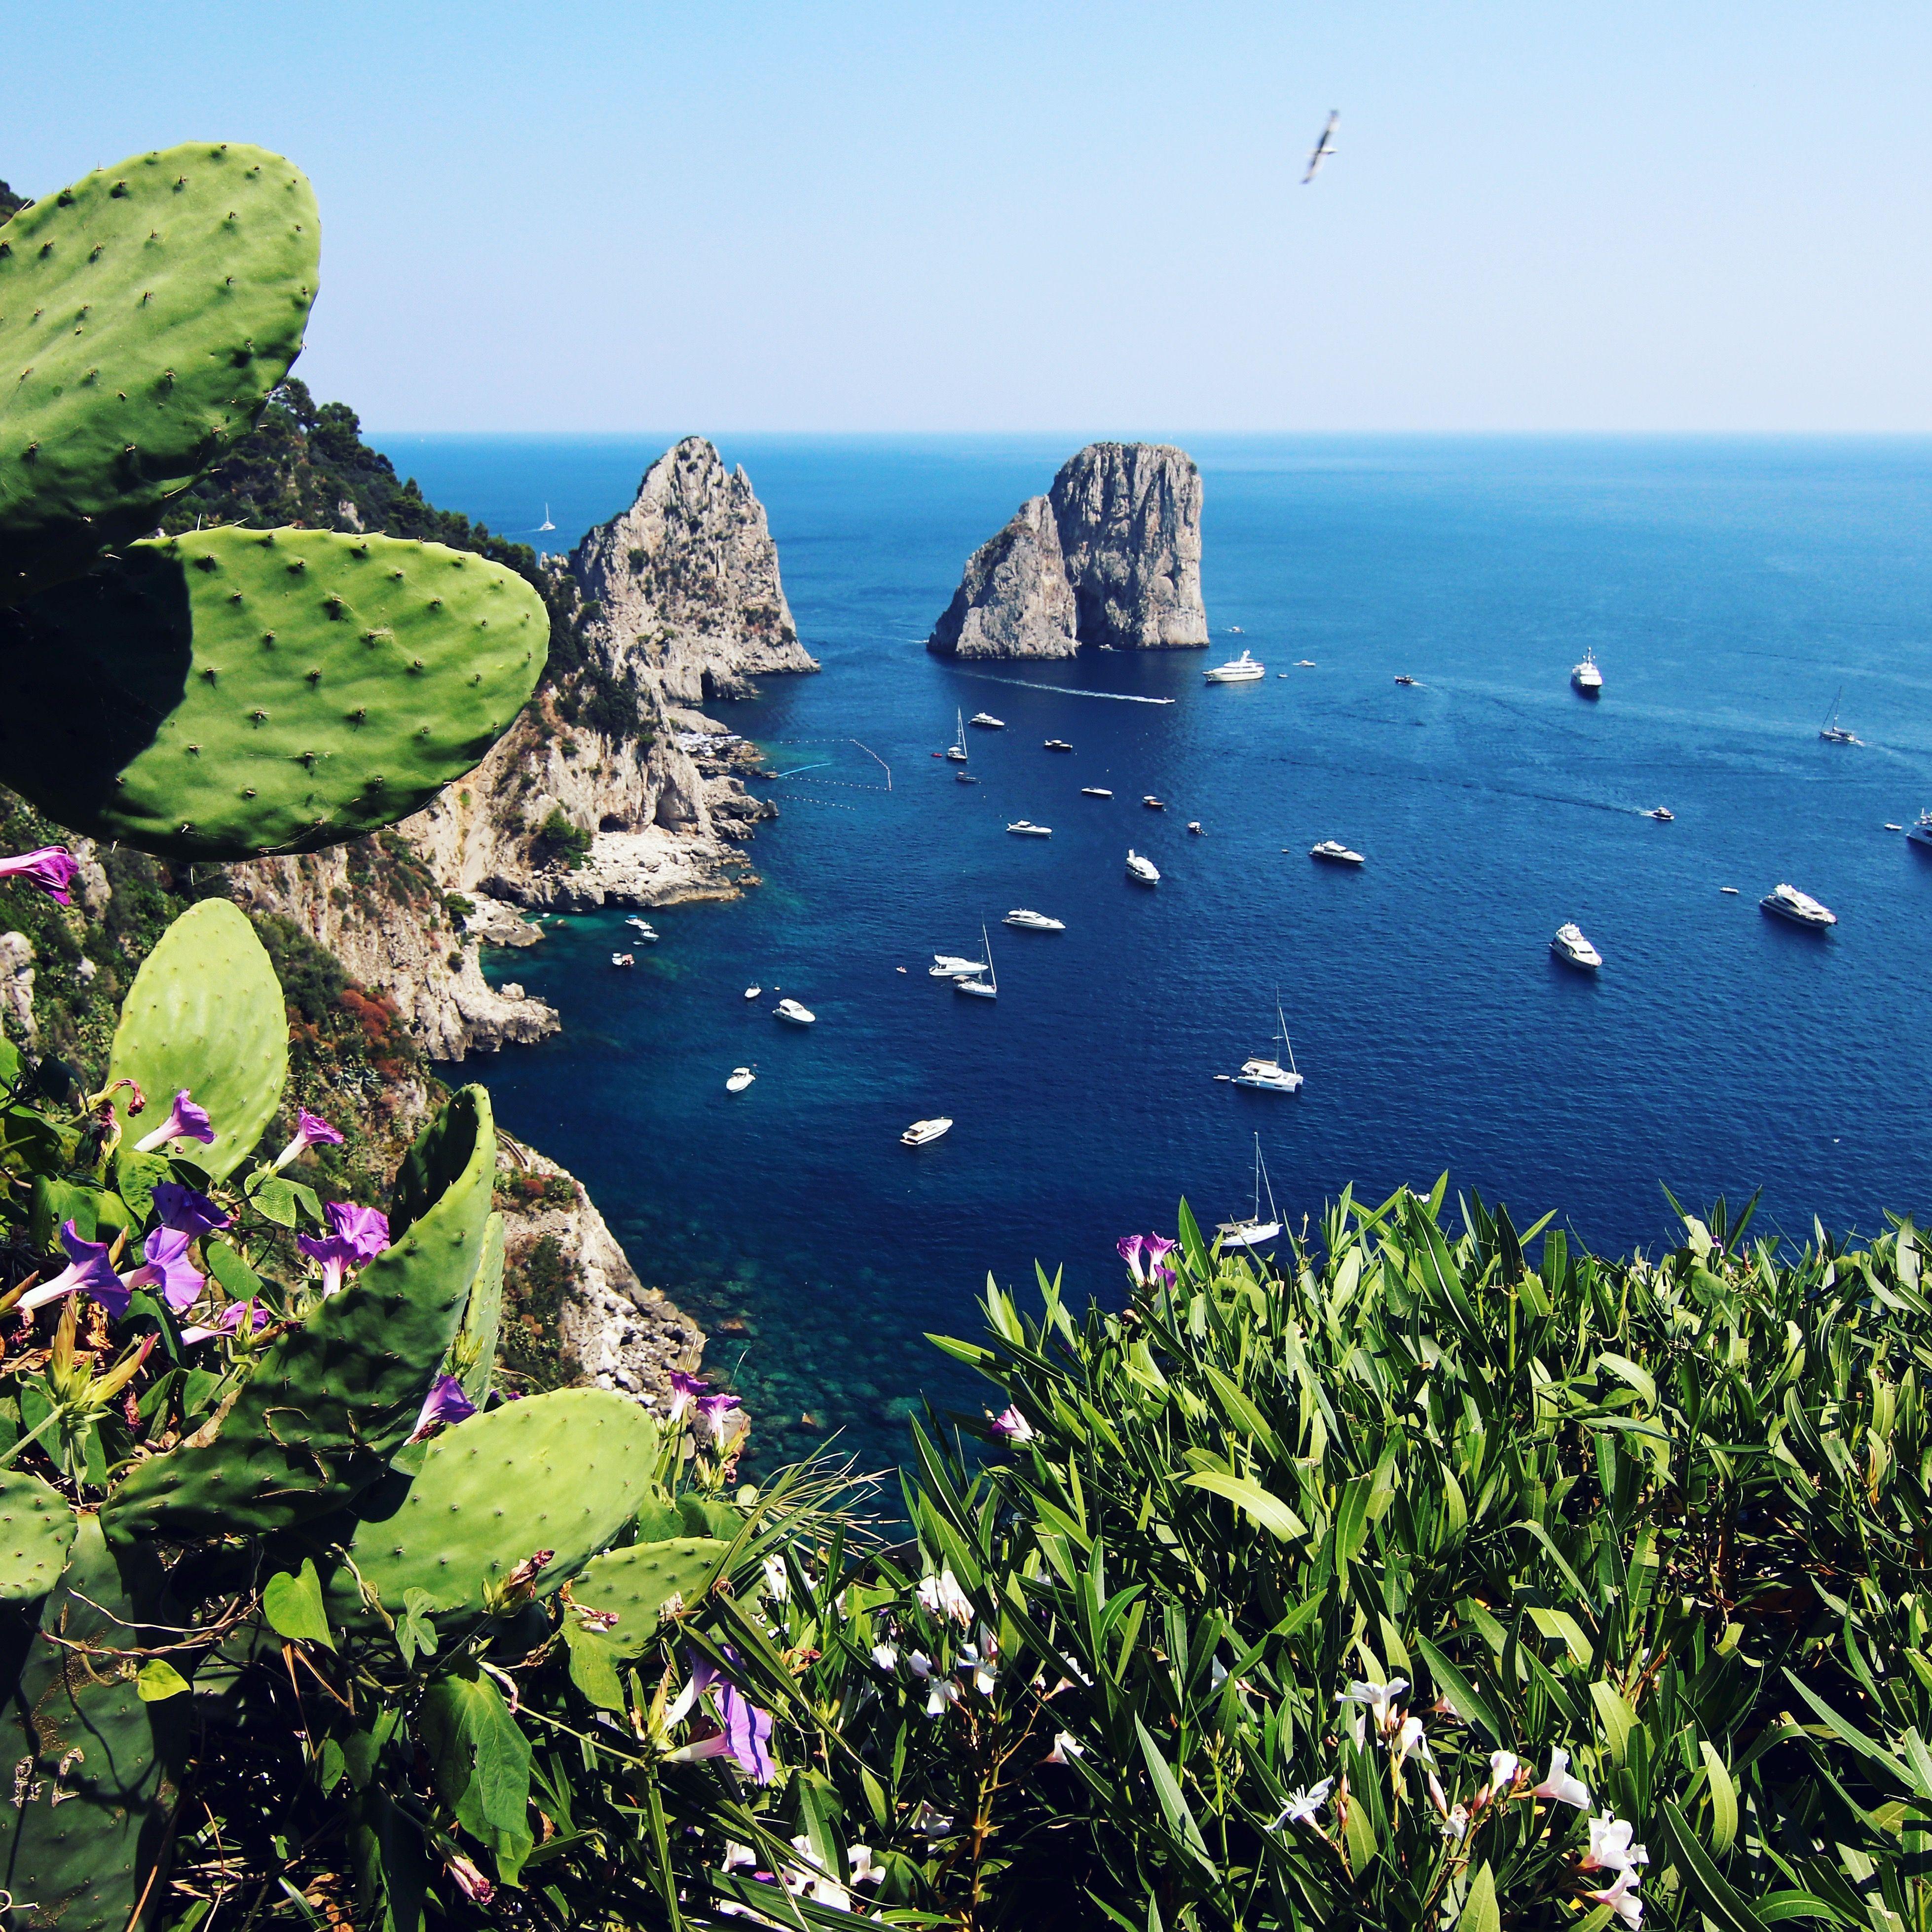 Italy Travel Agent |Naples, Pompeii, Sorrento, Positano ... |Capri Italy Golf